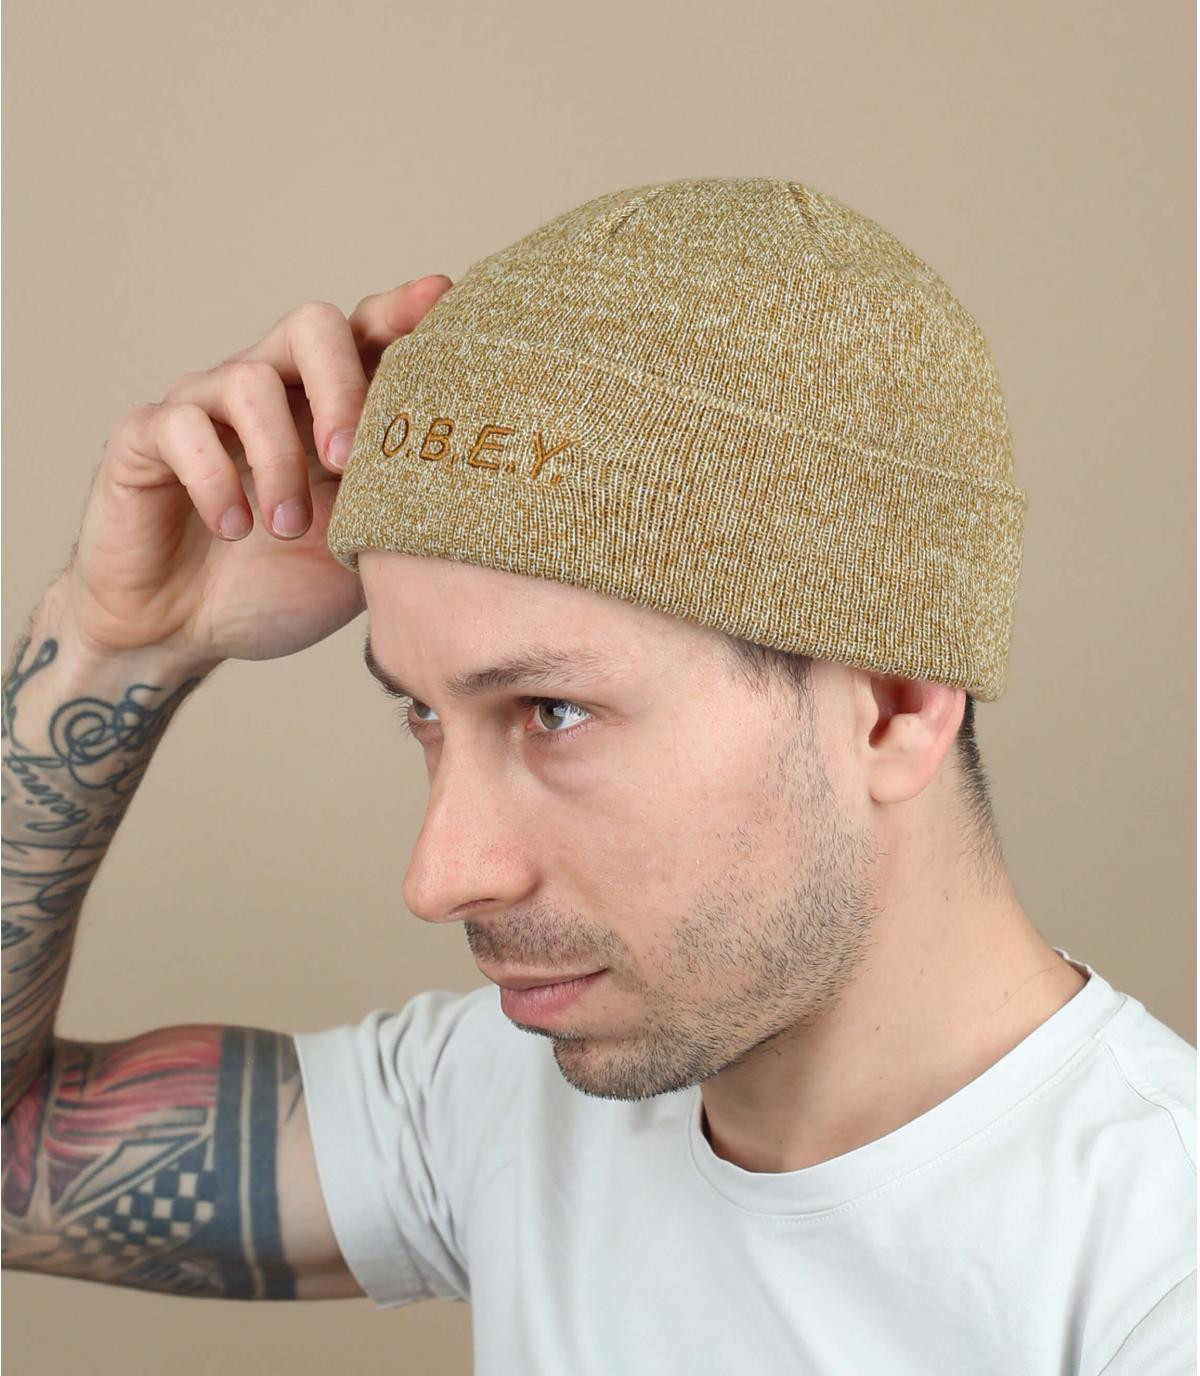 gorra de color beige Obey